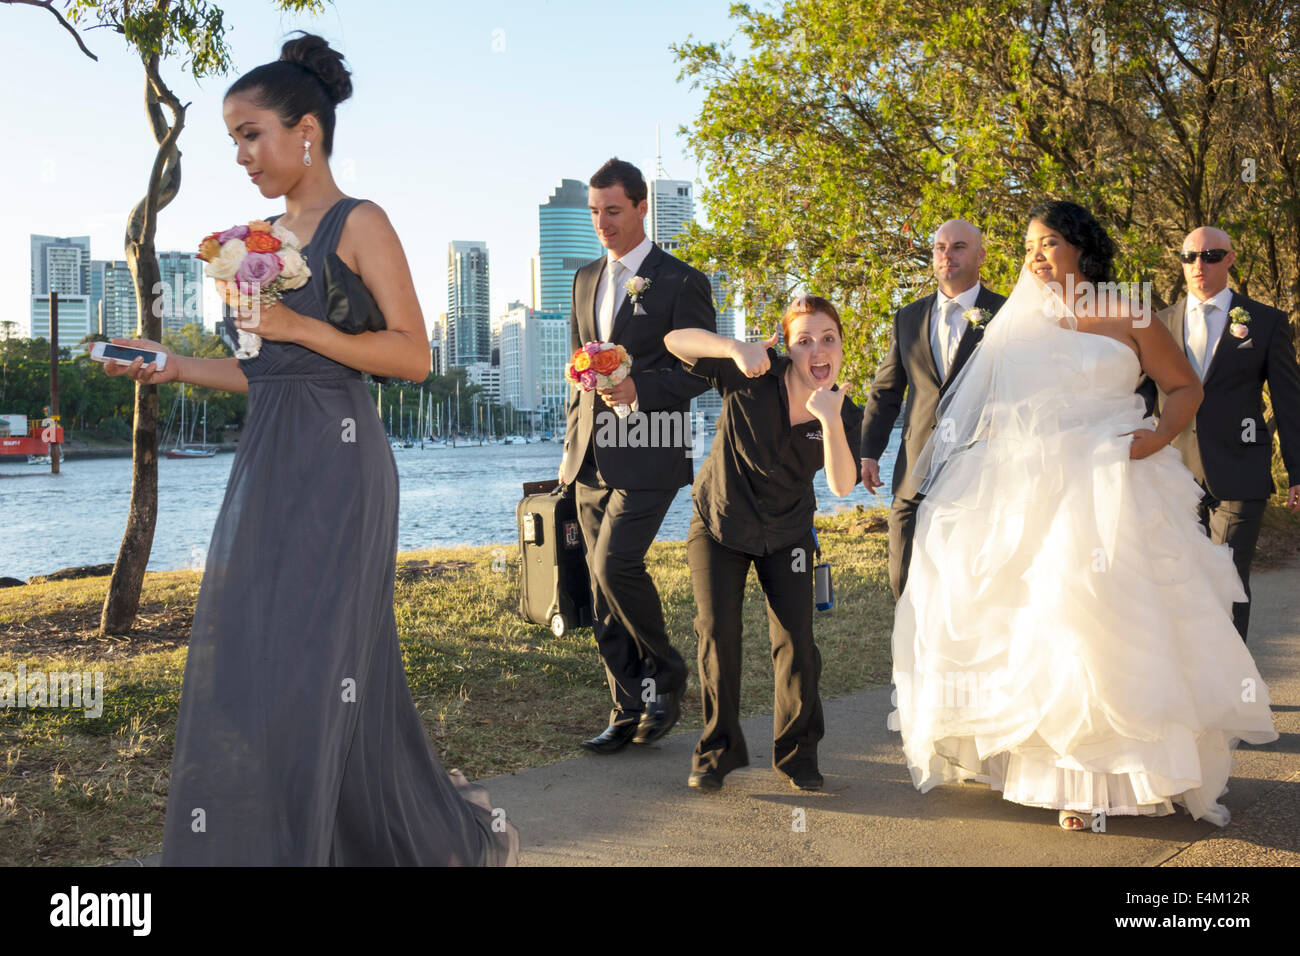 Brisbane Australia Queensland Kangaroo Point Cliffs Count White Park Black Woman Attendant Bridesmaid Bride Wedding Dress Party River